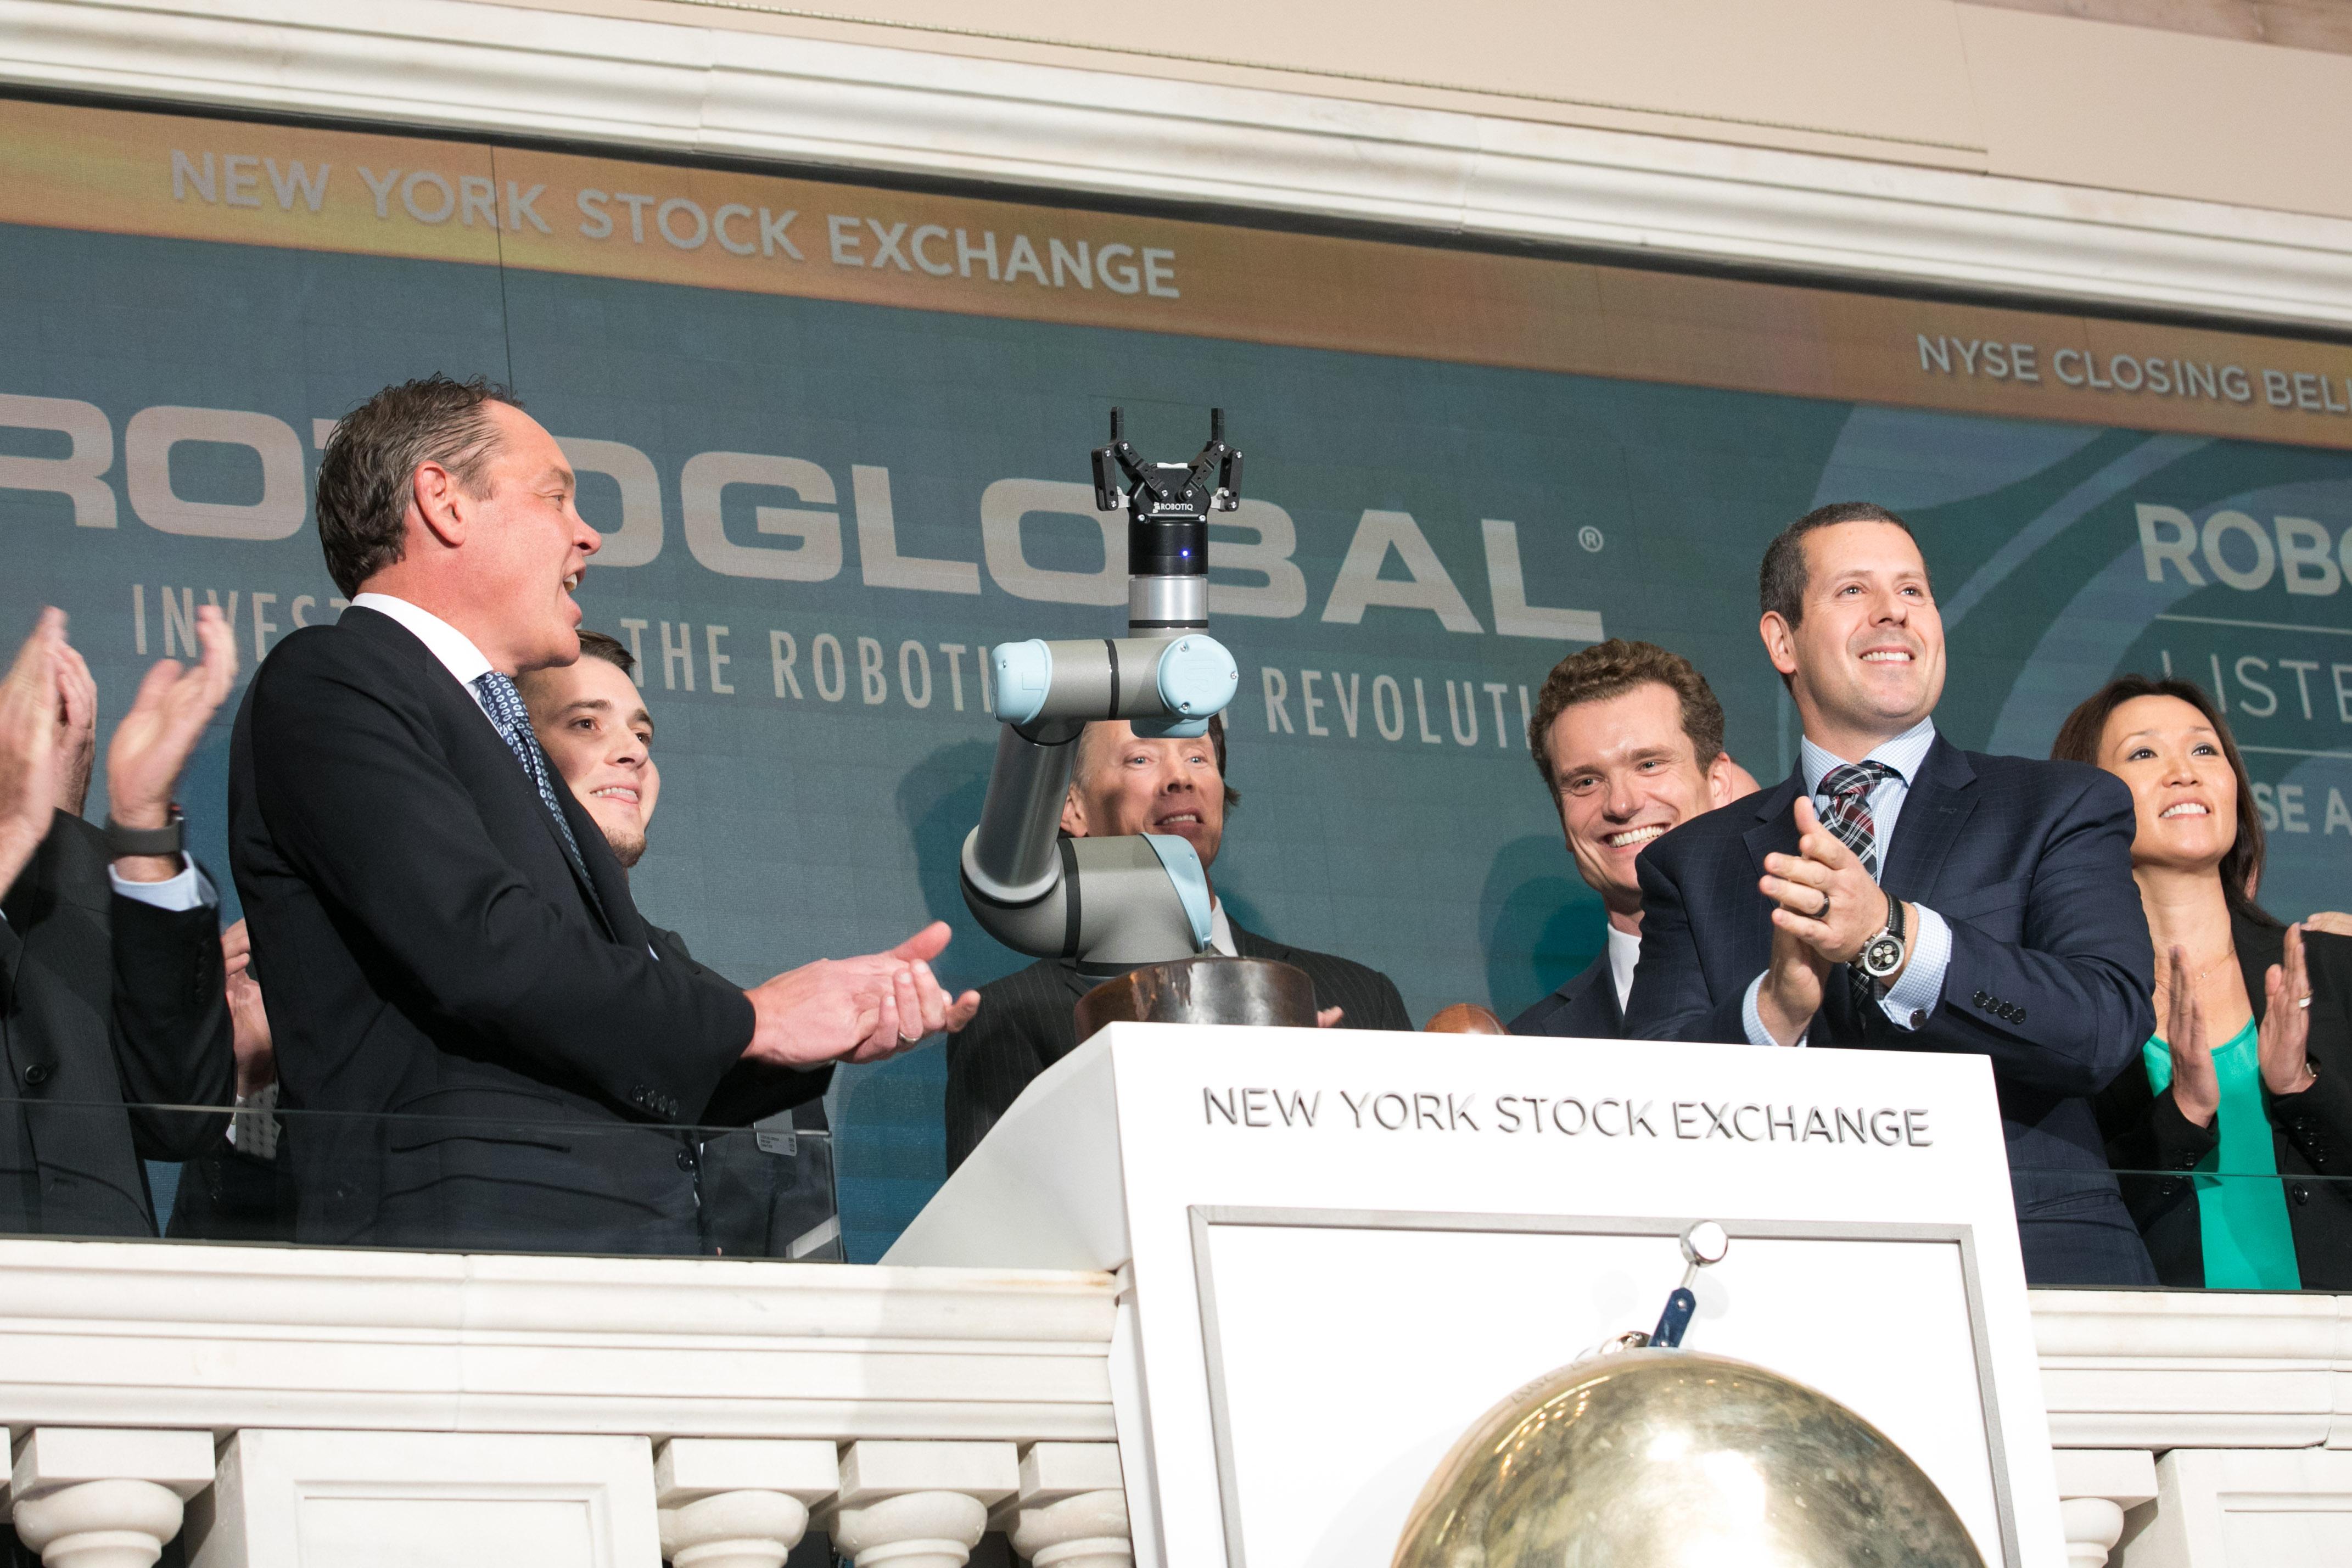 Robotiq Rings the NYC Stock Echange Closing Bell!